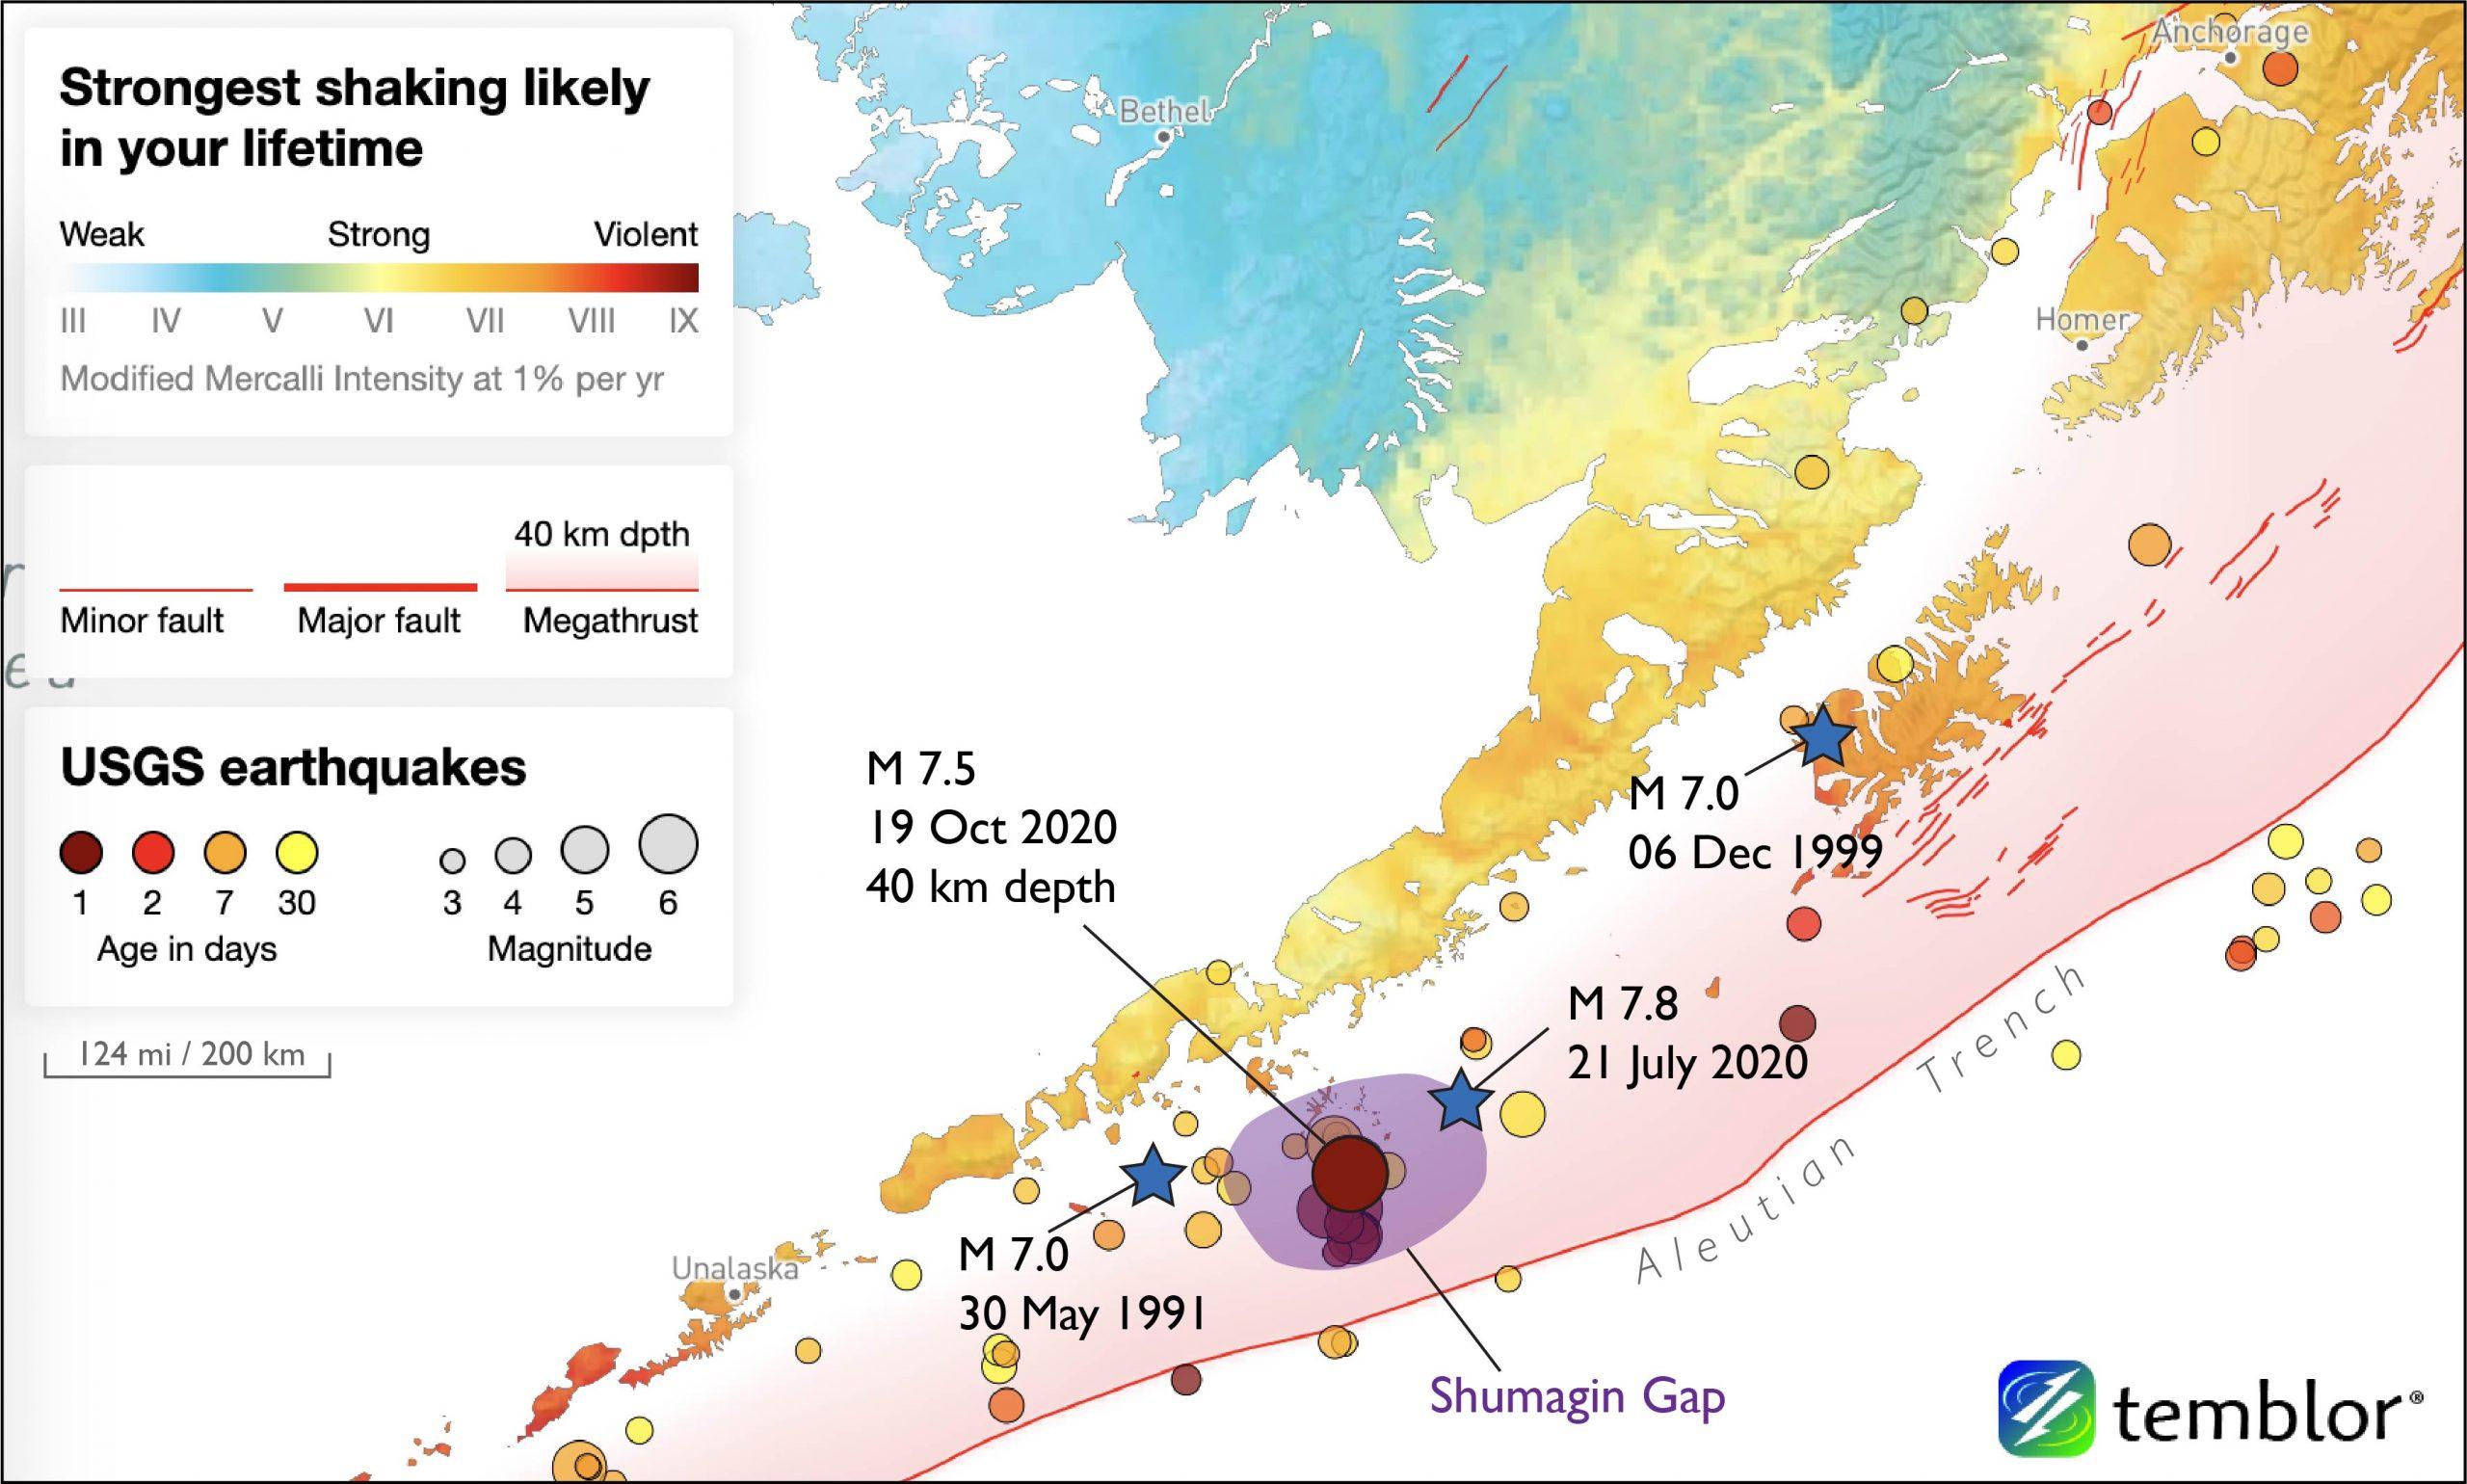 M7.8 earthquake location map